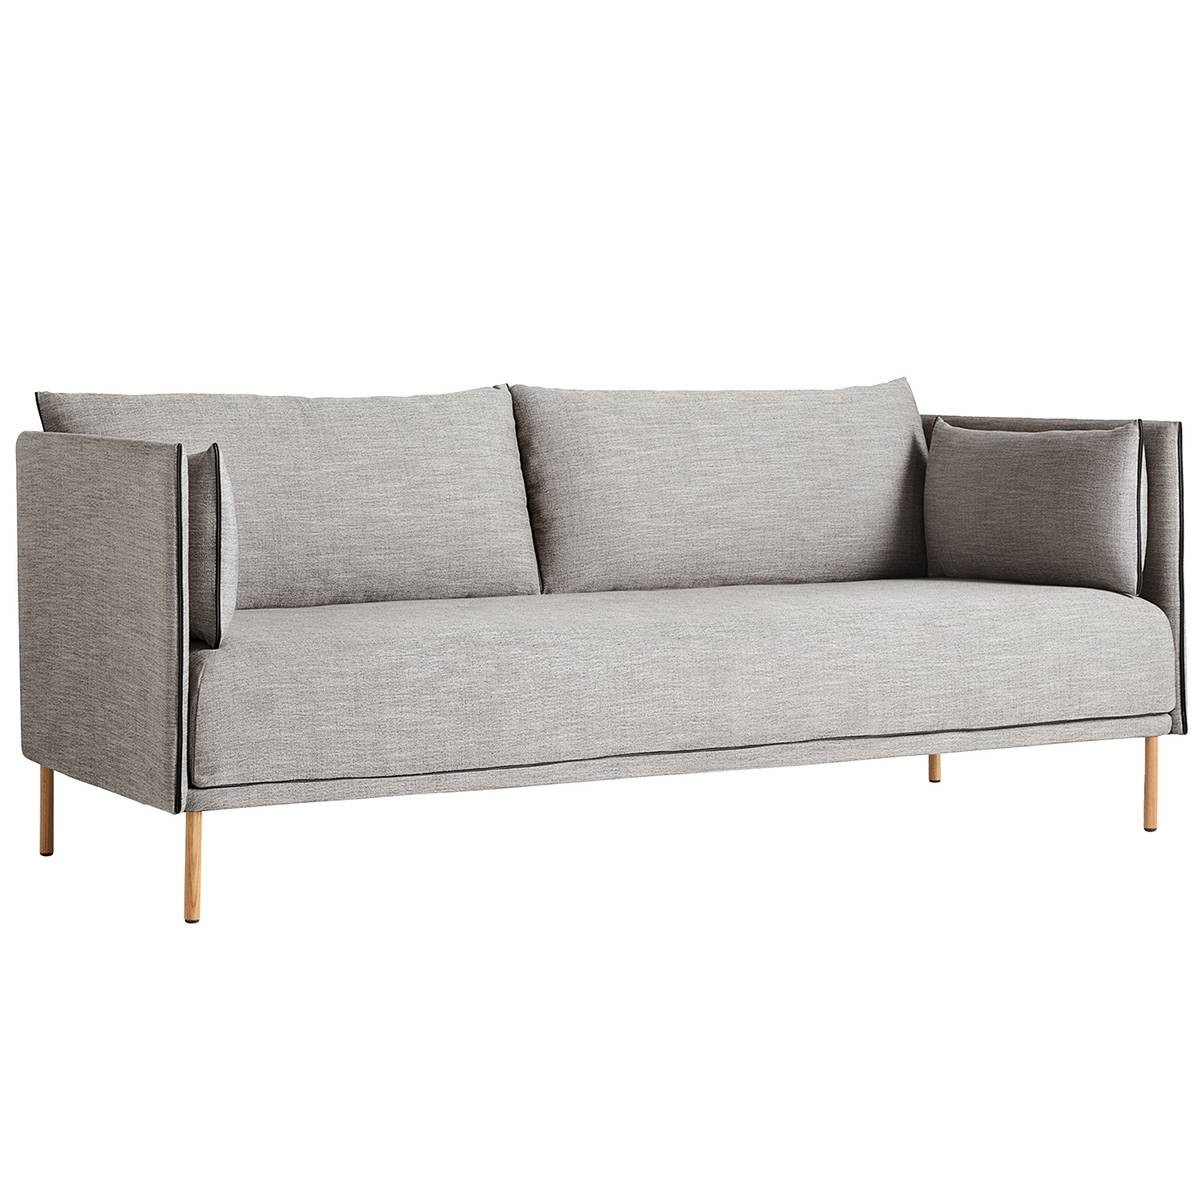 Image of Hay Silhouette sohva 2-ist, Ruskin 33/Silk black - öljytty tammi